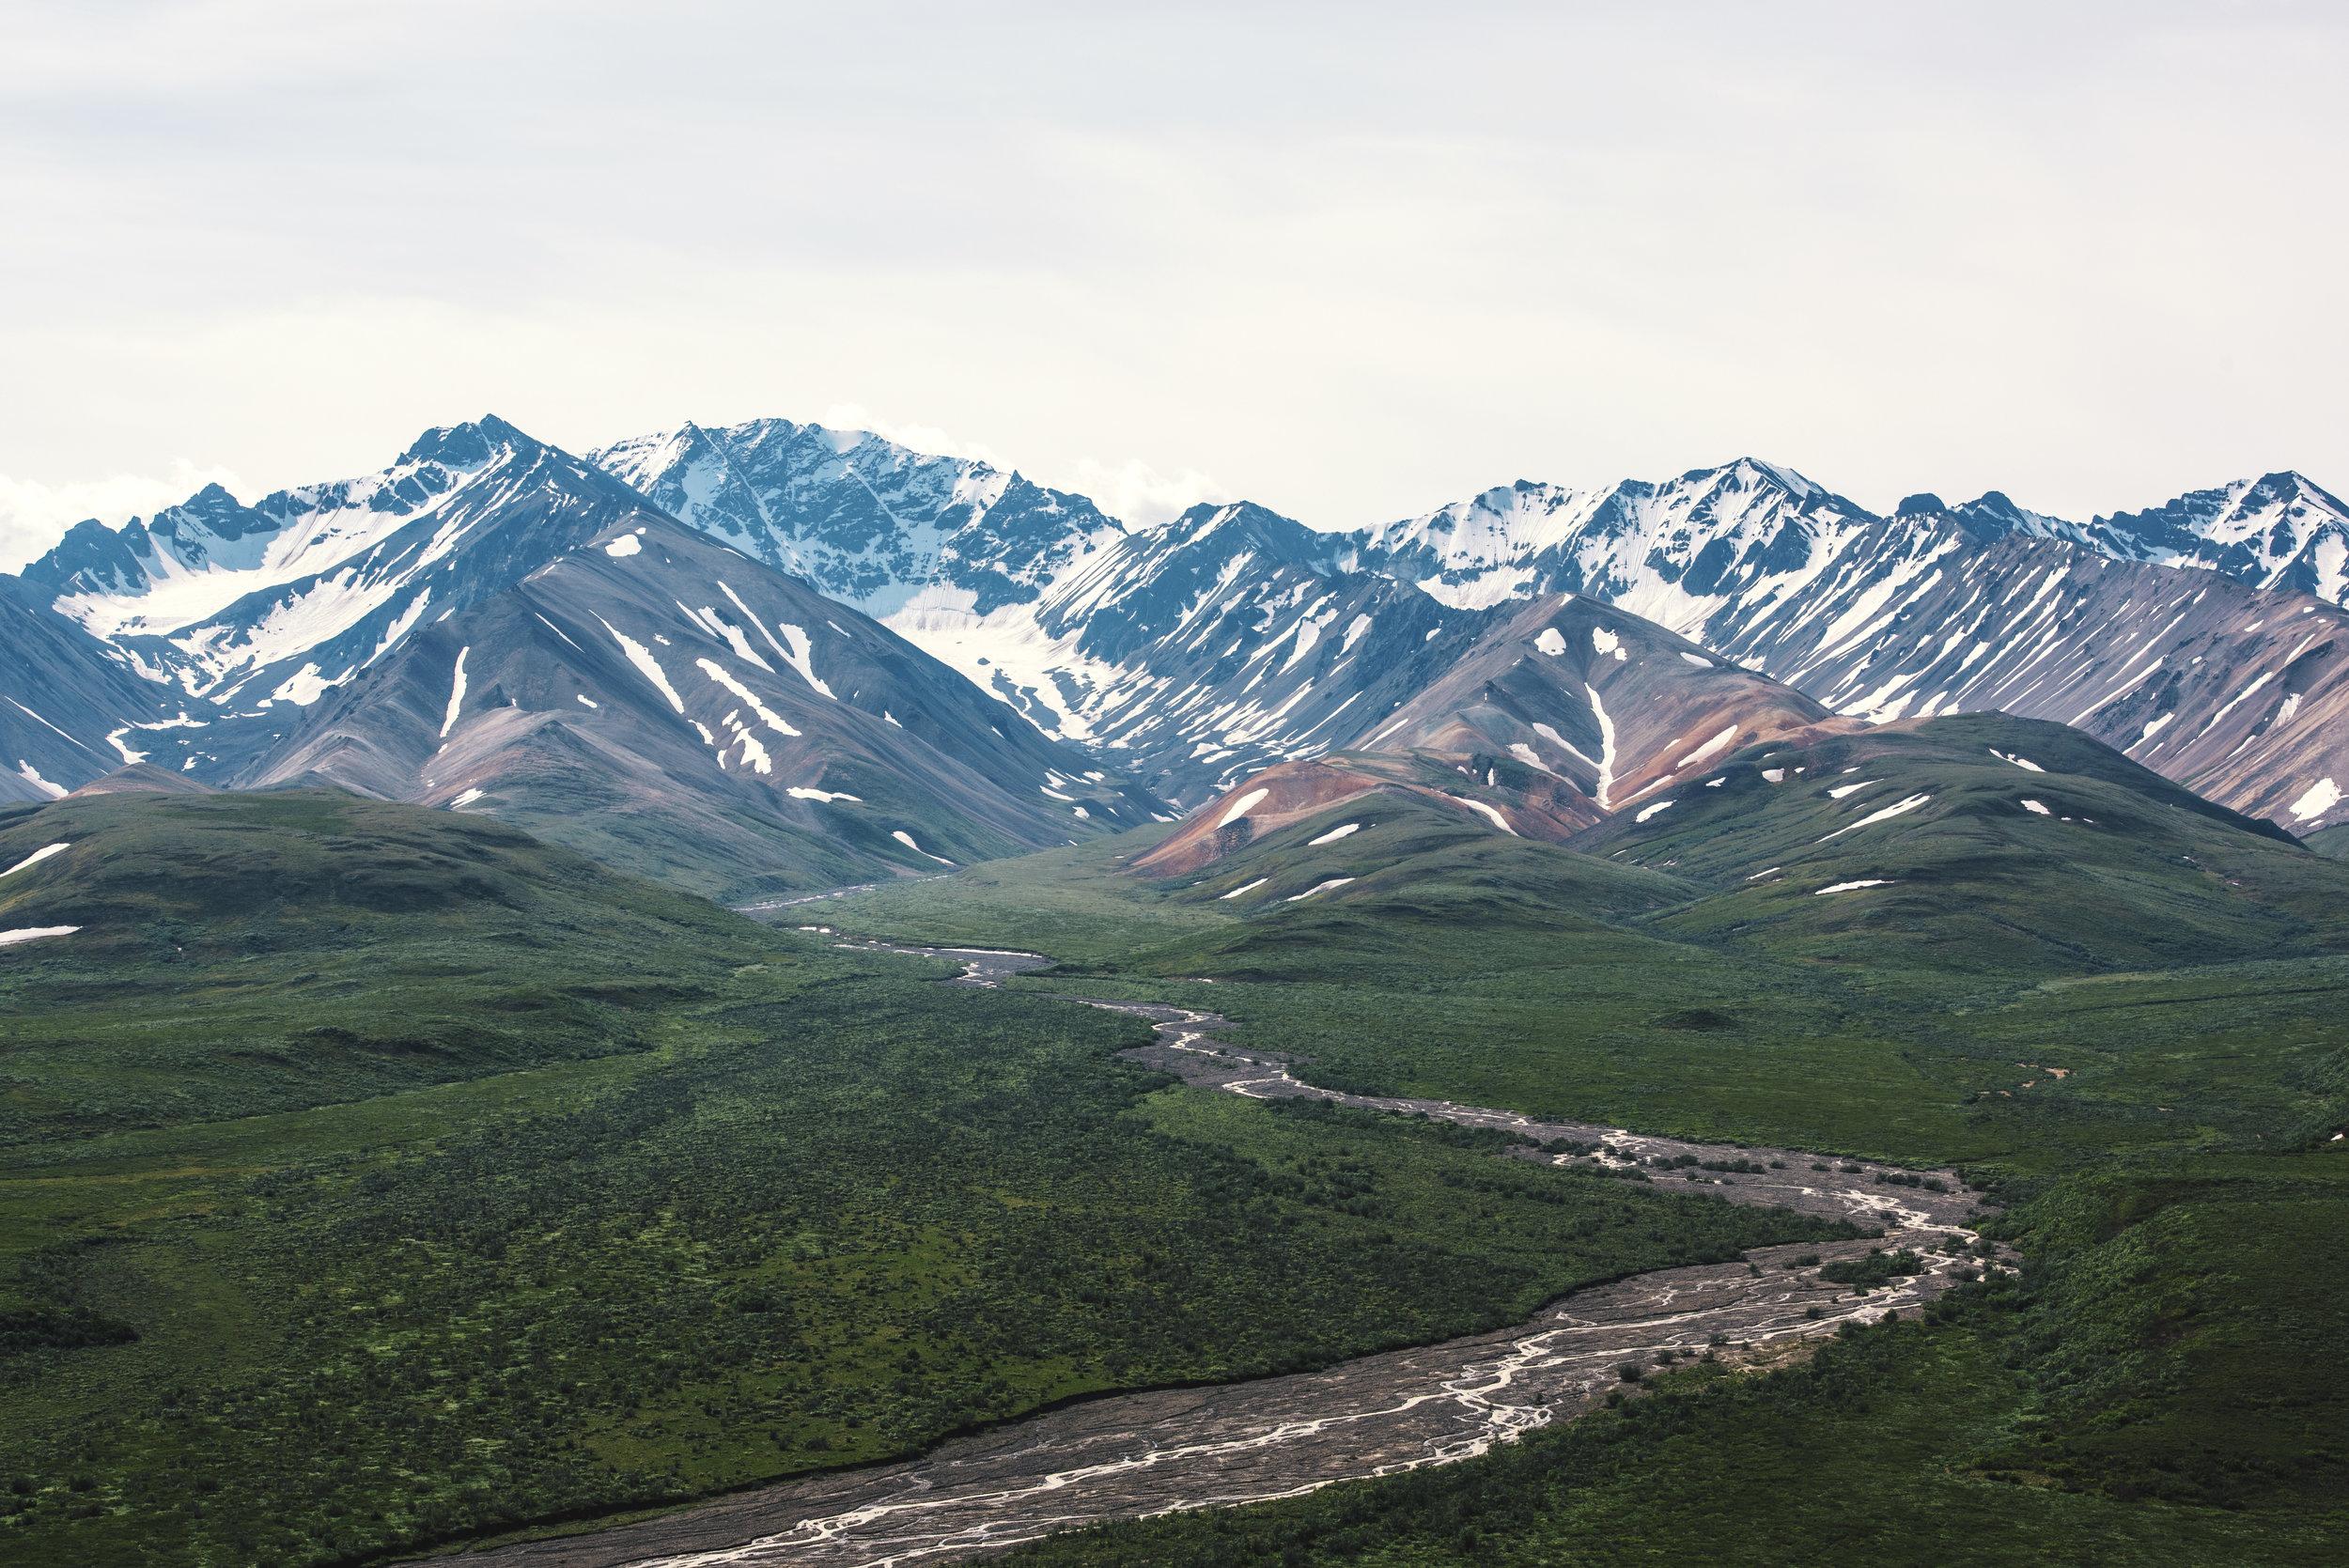 mountains_denali.jpg